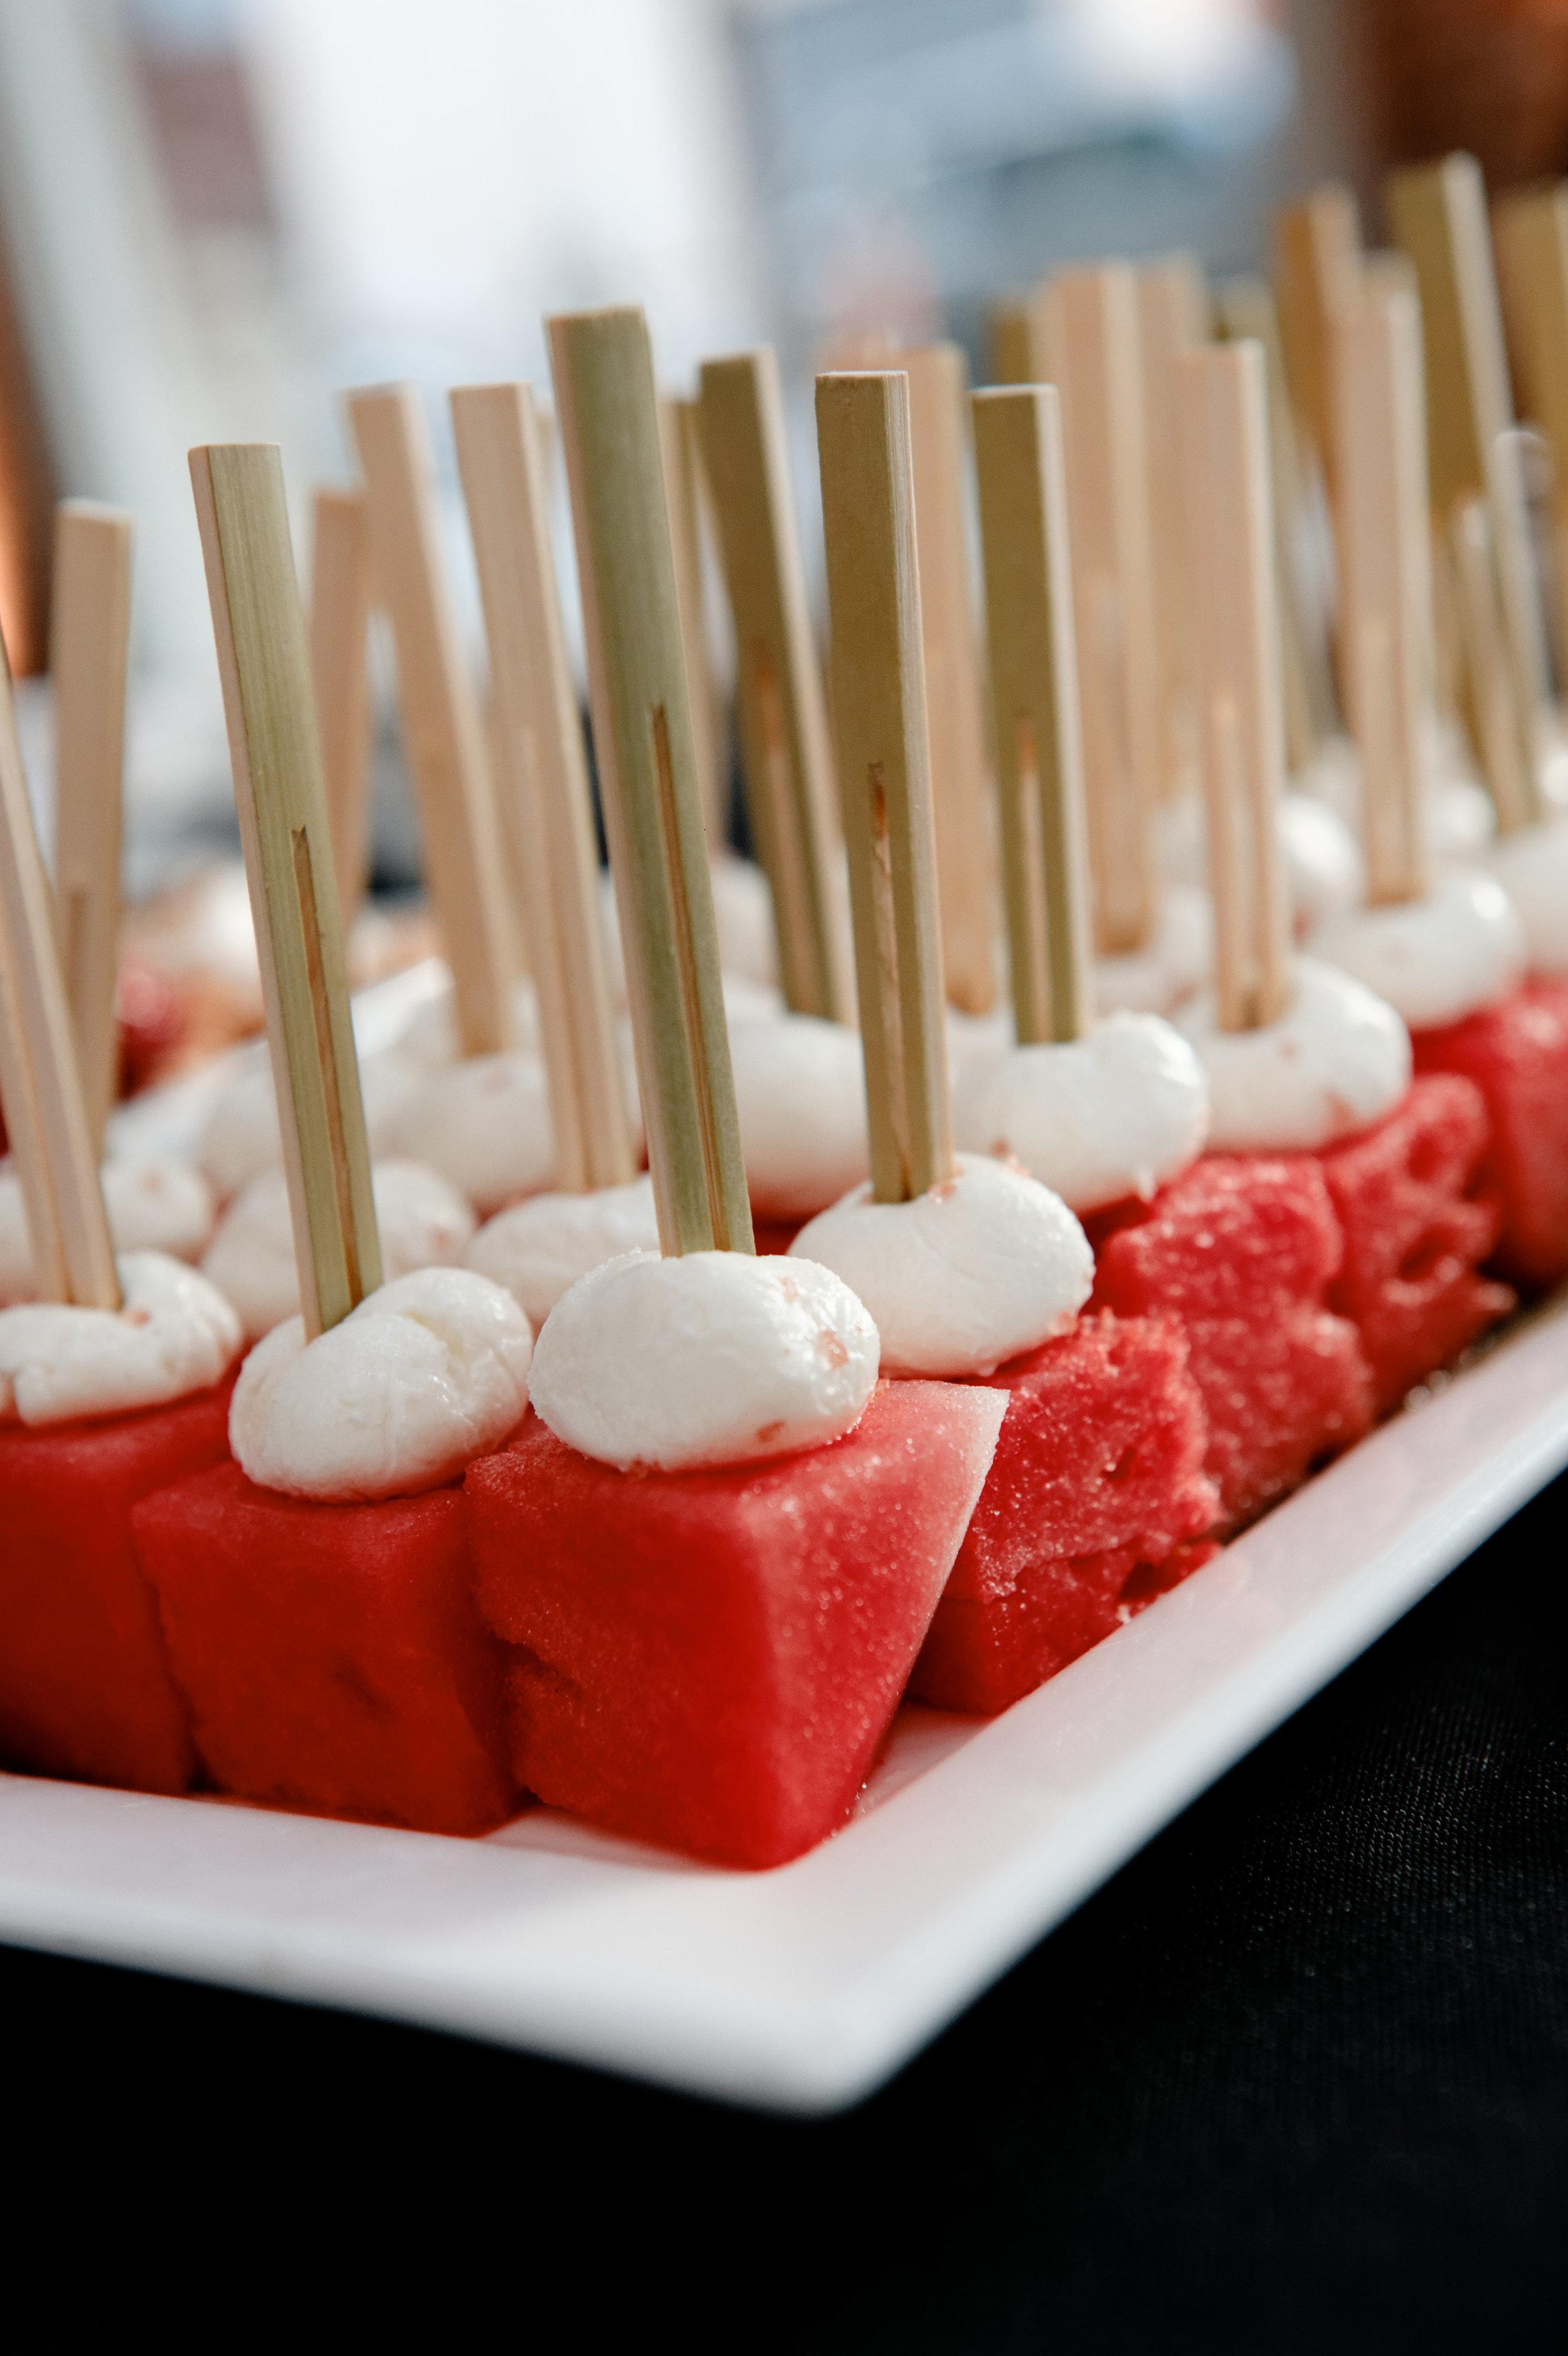 Watermelon & Goat Cheese Bites